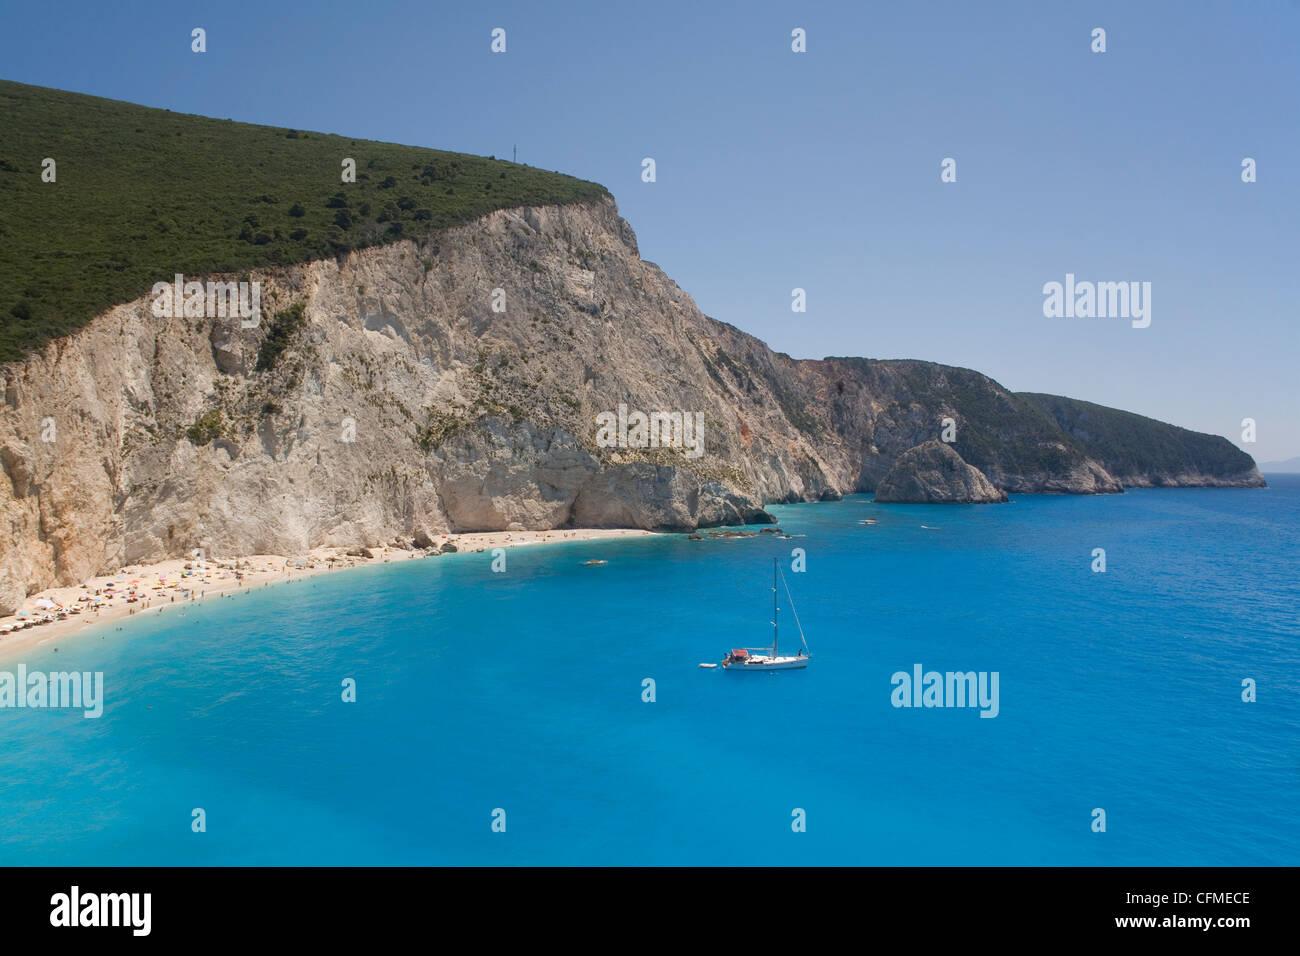 Porto Katsiki, Lefkada, Ionian Islands, Greek Islands, Greece, Europe - Stock Image